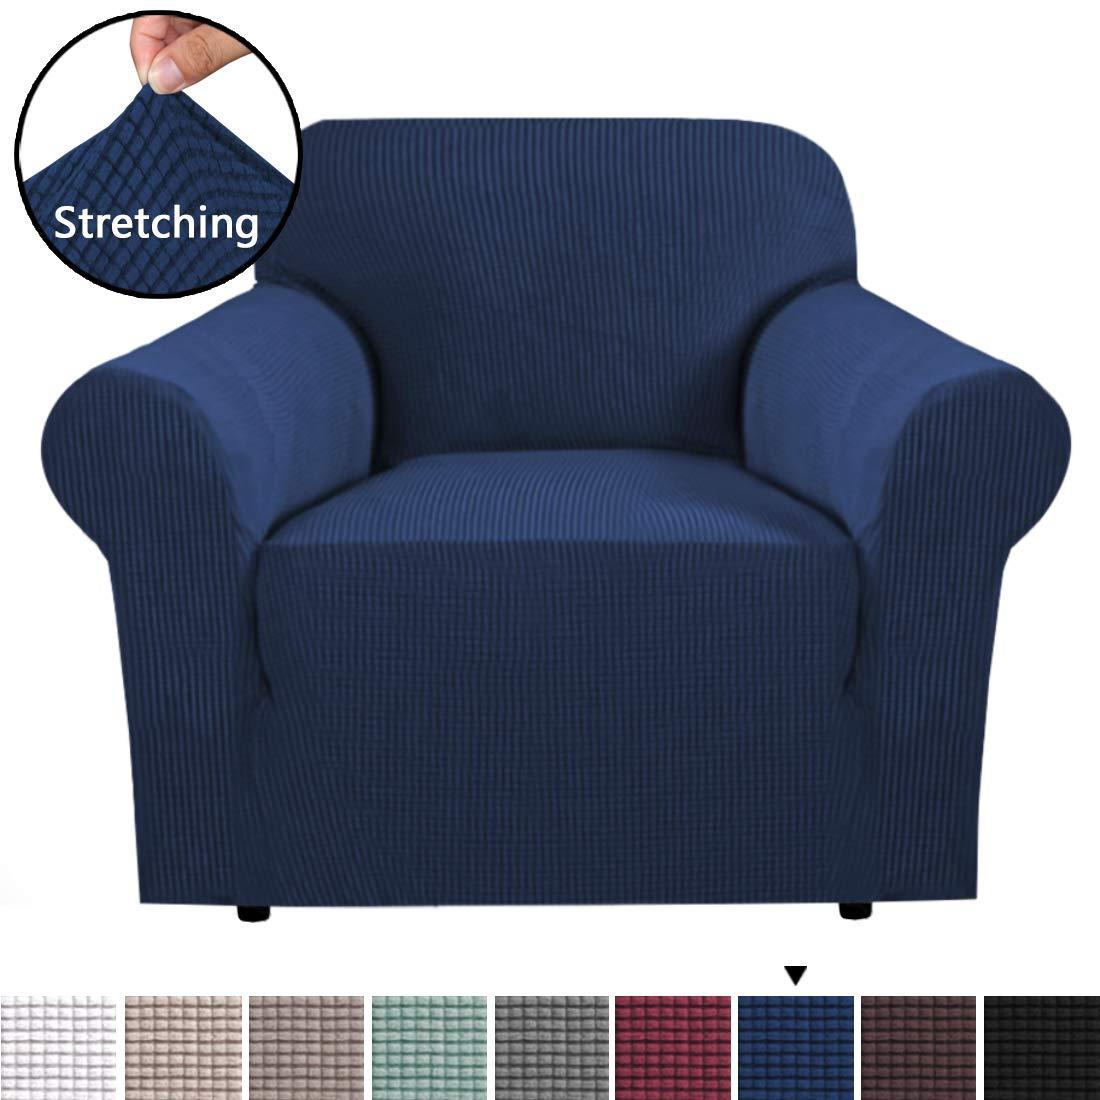 H.VERSAILTEX ストレッチソファースリップカバー 1枚 ライクラジャカードスパンデックス カウチカバー 洗濯機洗い可 マルチカラー サイズ Chair ブルー HVSOFA1P1NAVY Chair ネイビー B07MCXPKFP